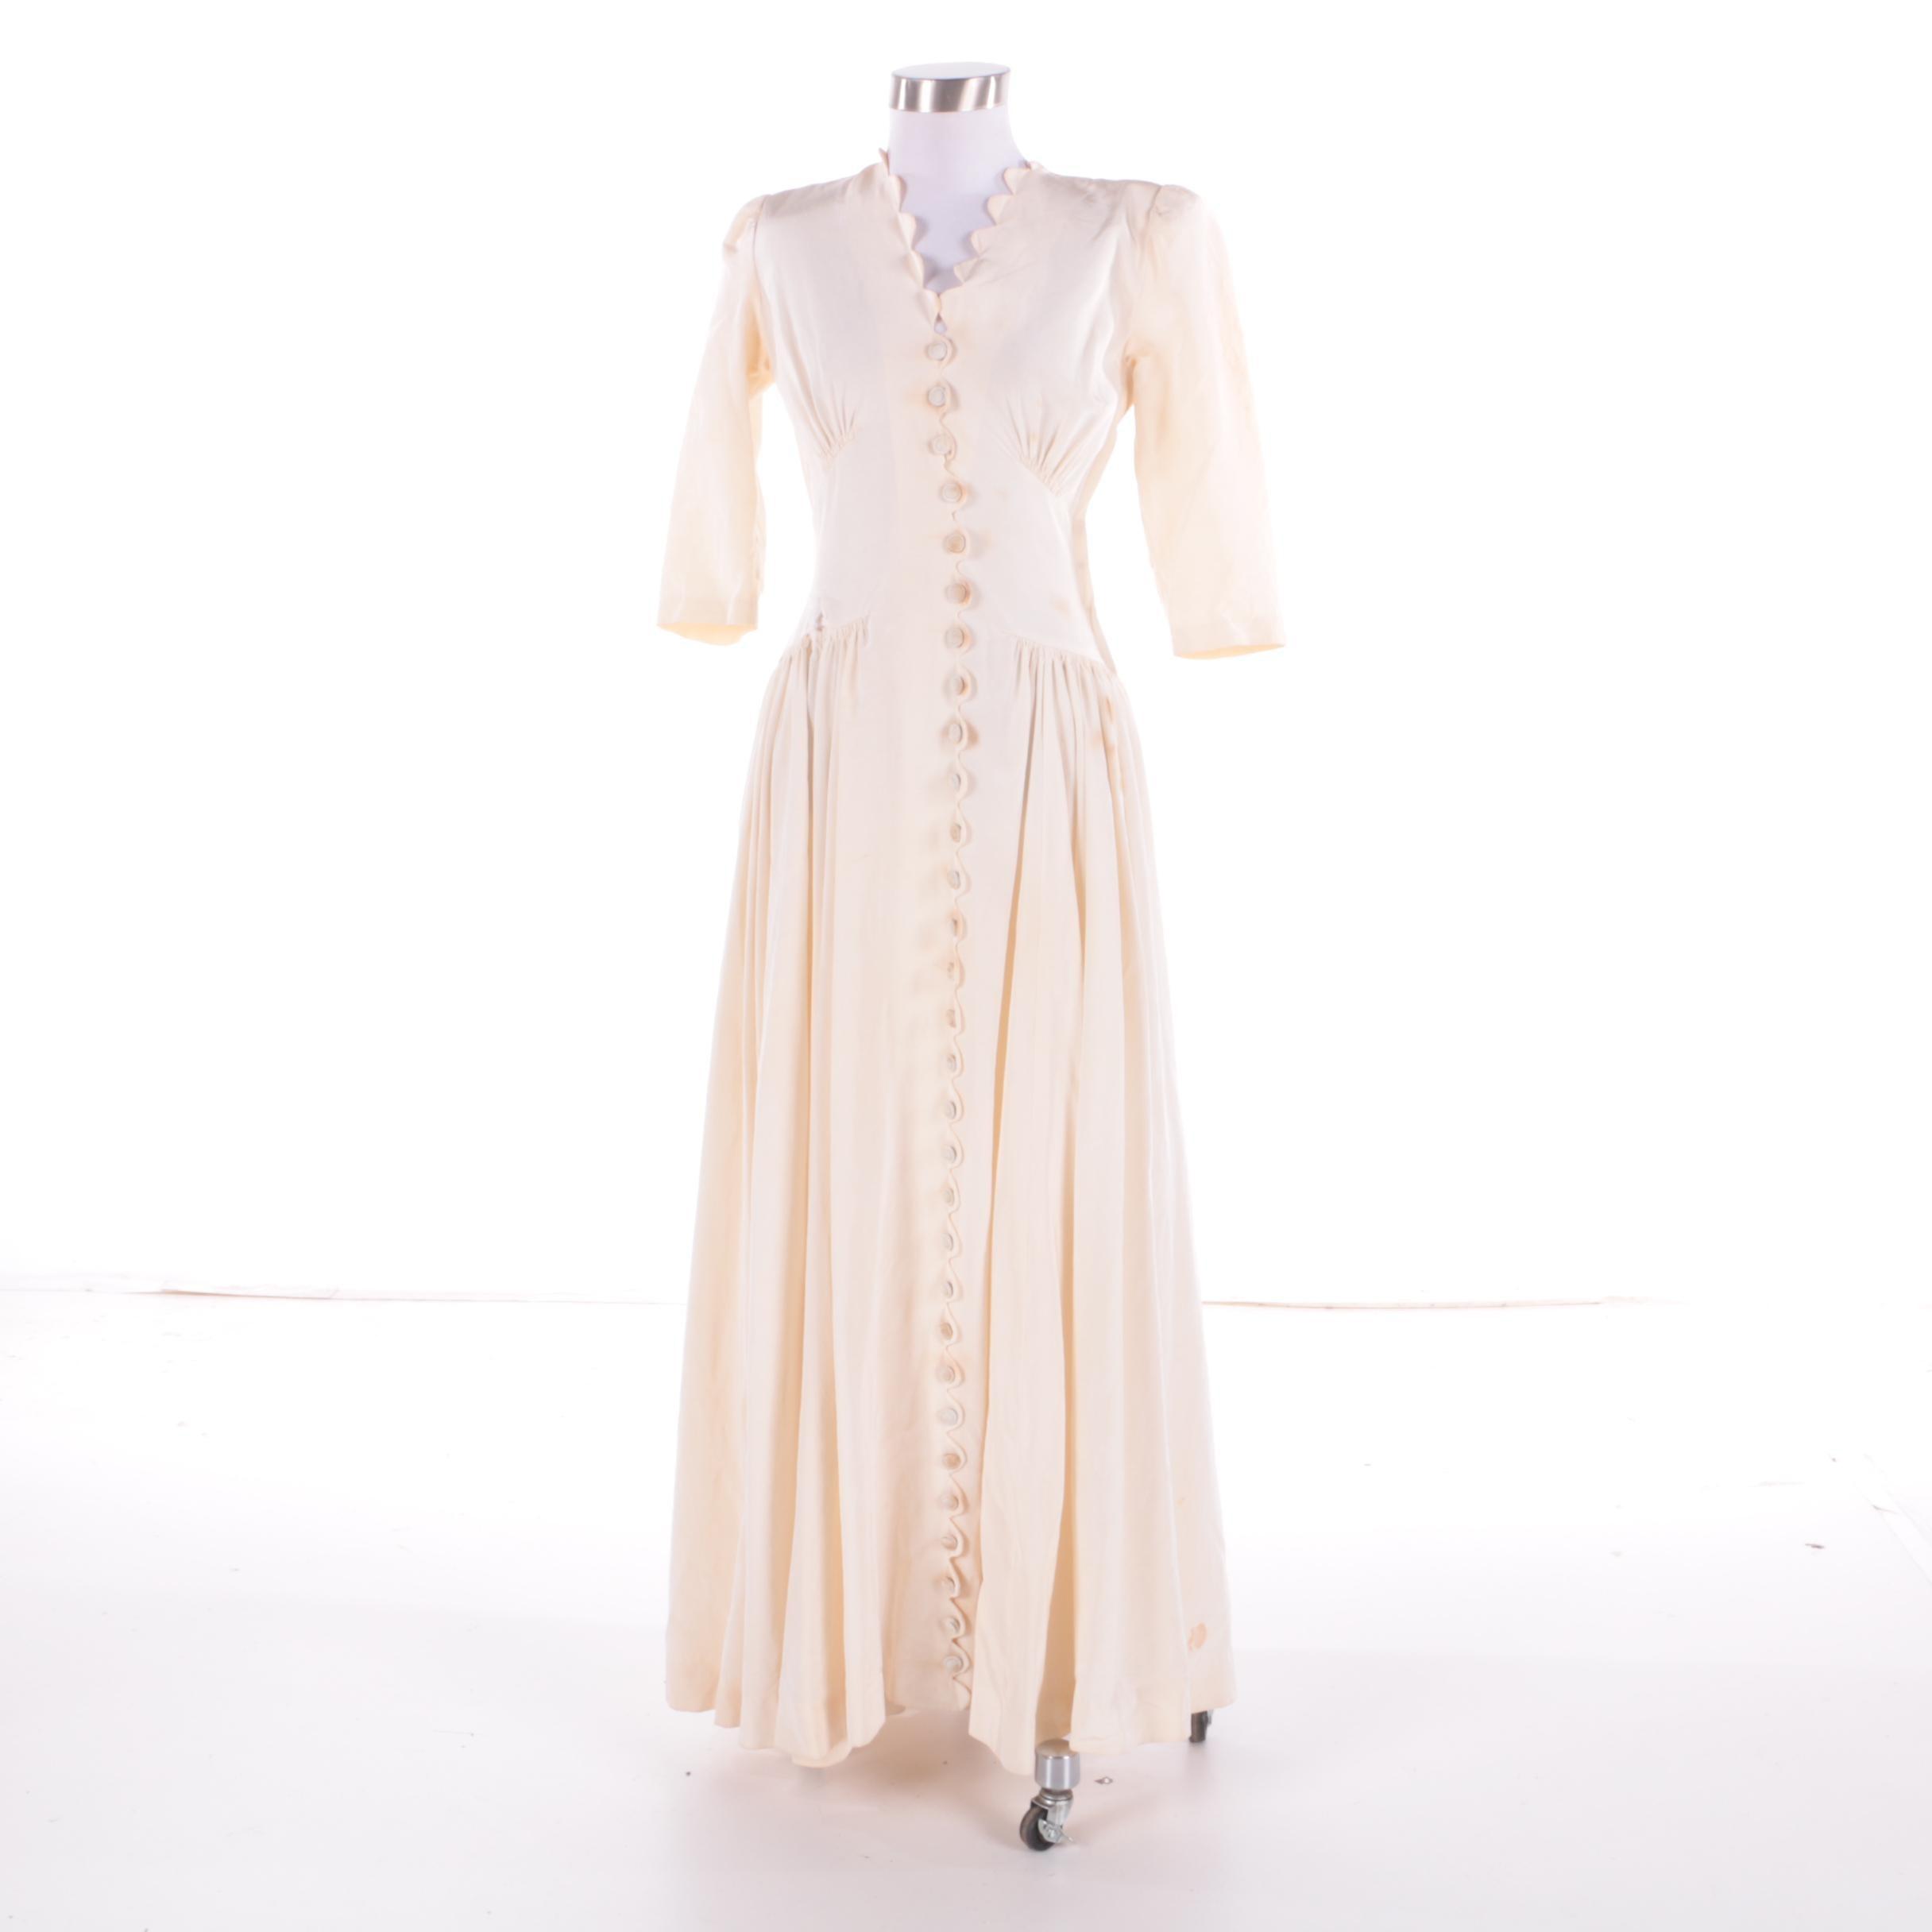 1930s Vintage Bias Cut Ivory Silk Dress